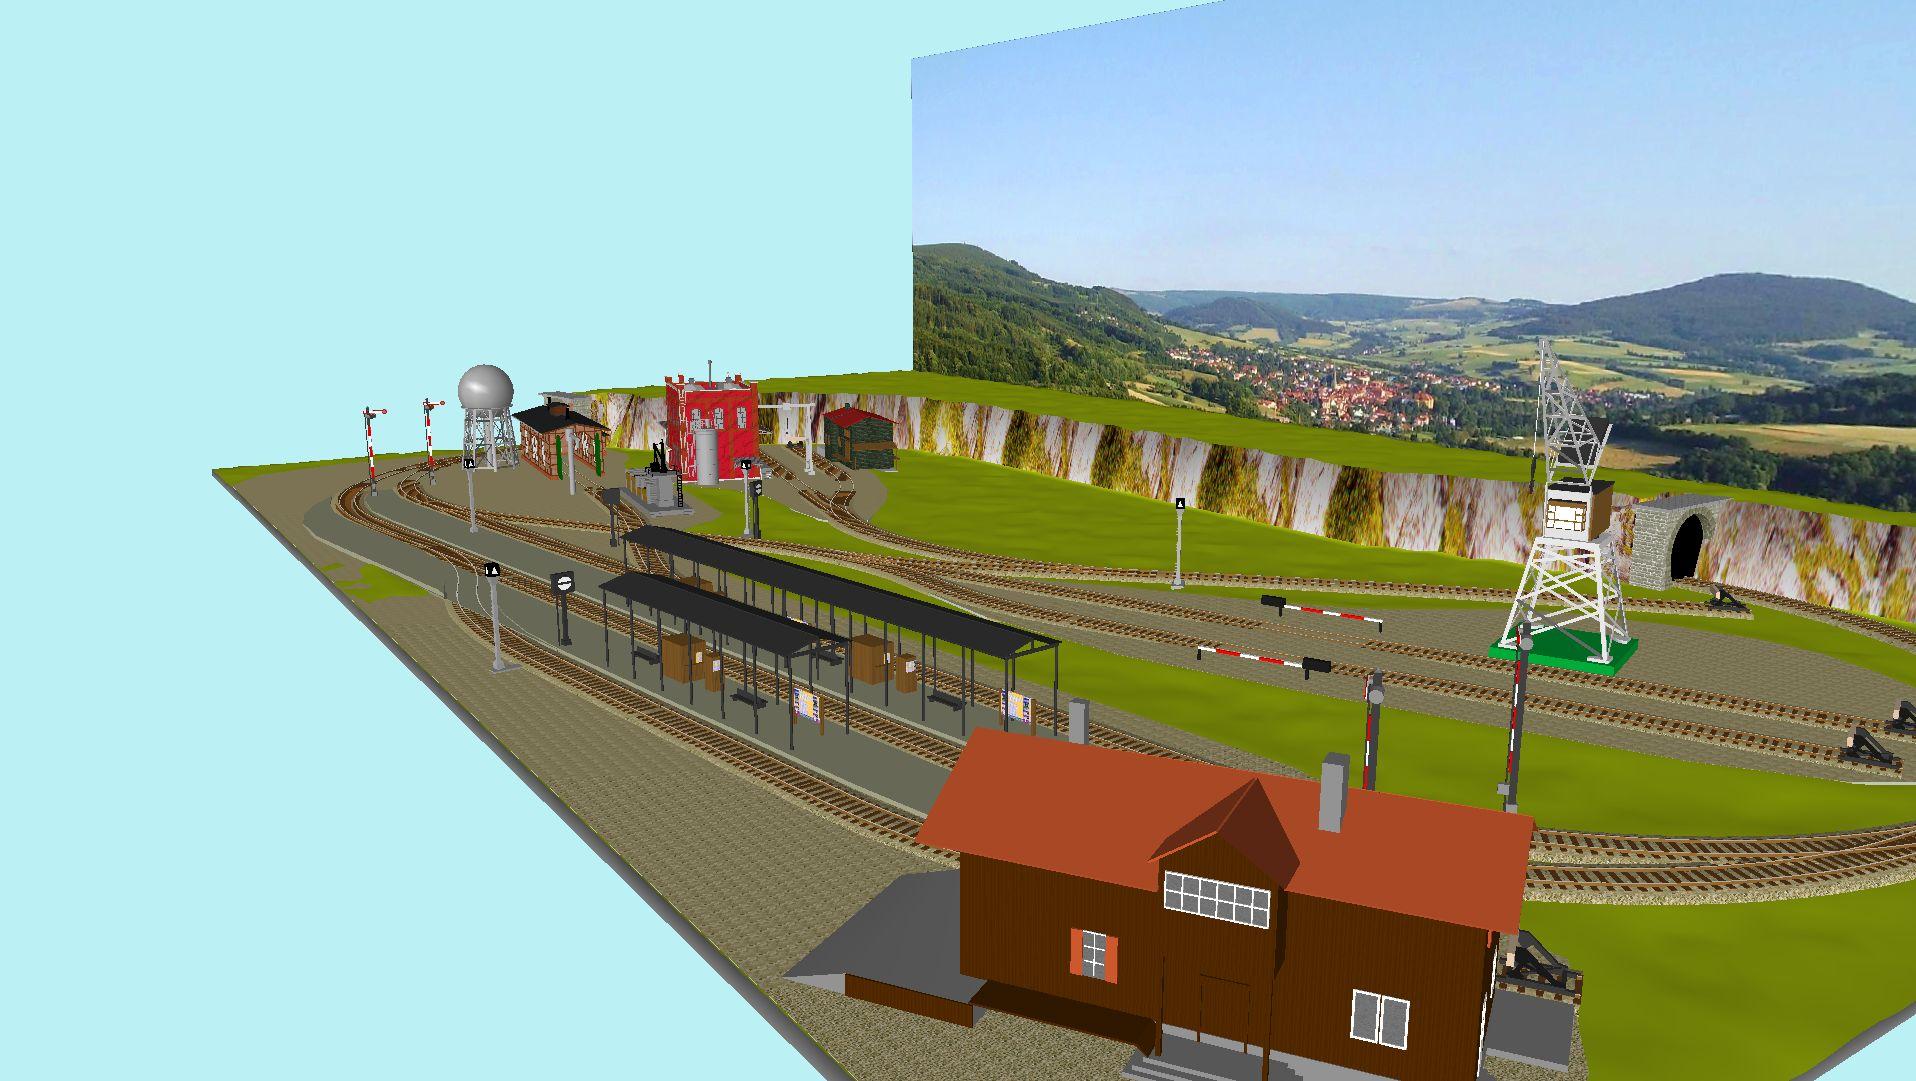 'ALBA Modellbahnpraxis' Band 1, Plan 5 Amp-1_5_m-gleis_jrg_1mzjdp